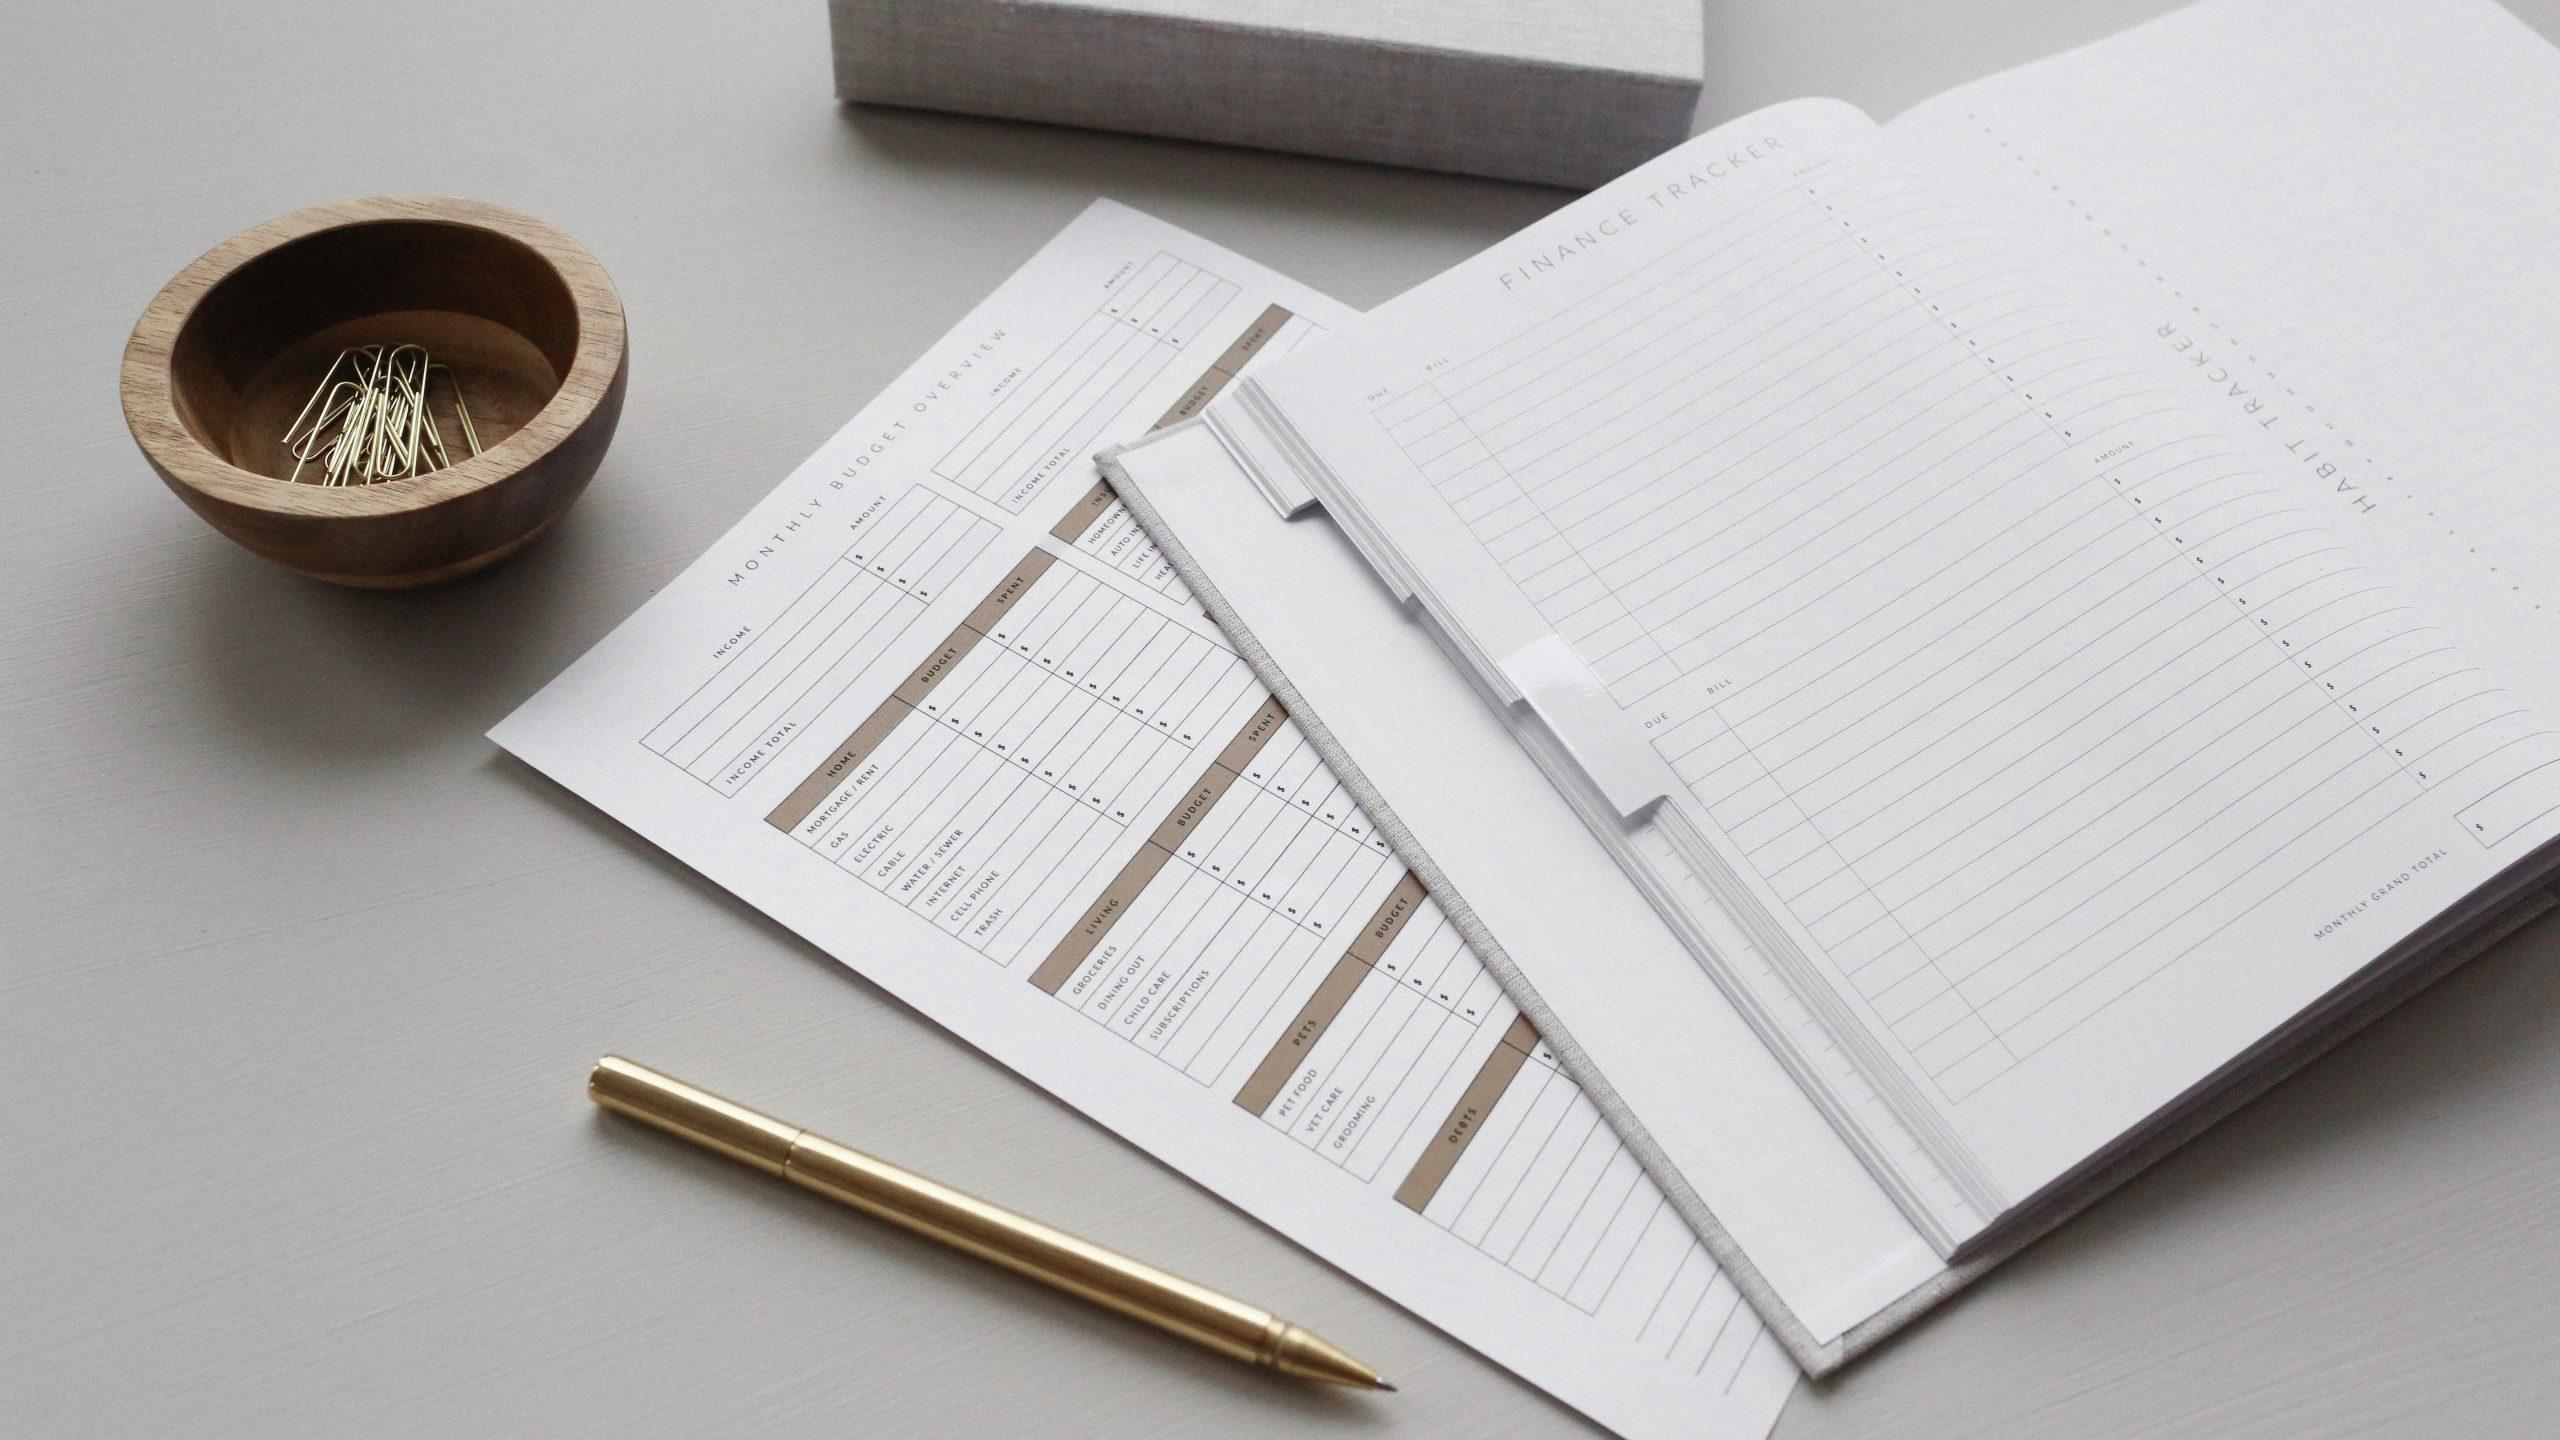 finacnial accountants brisbane documents on paper